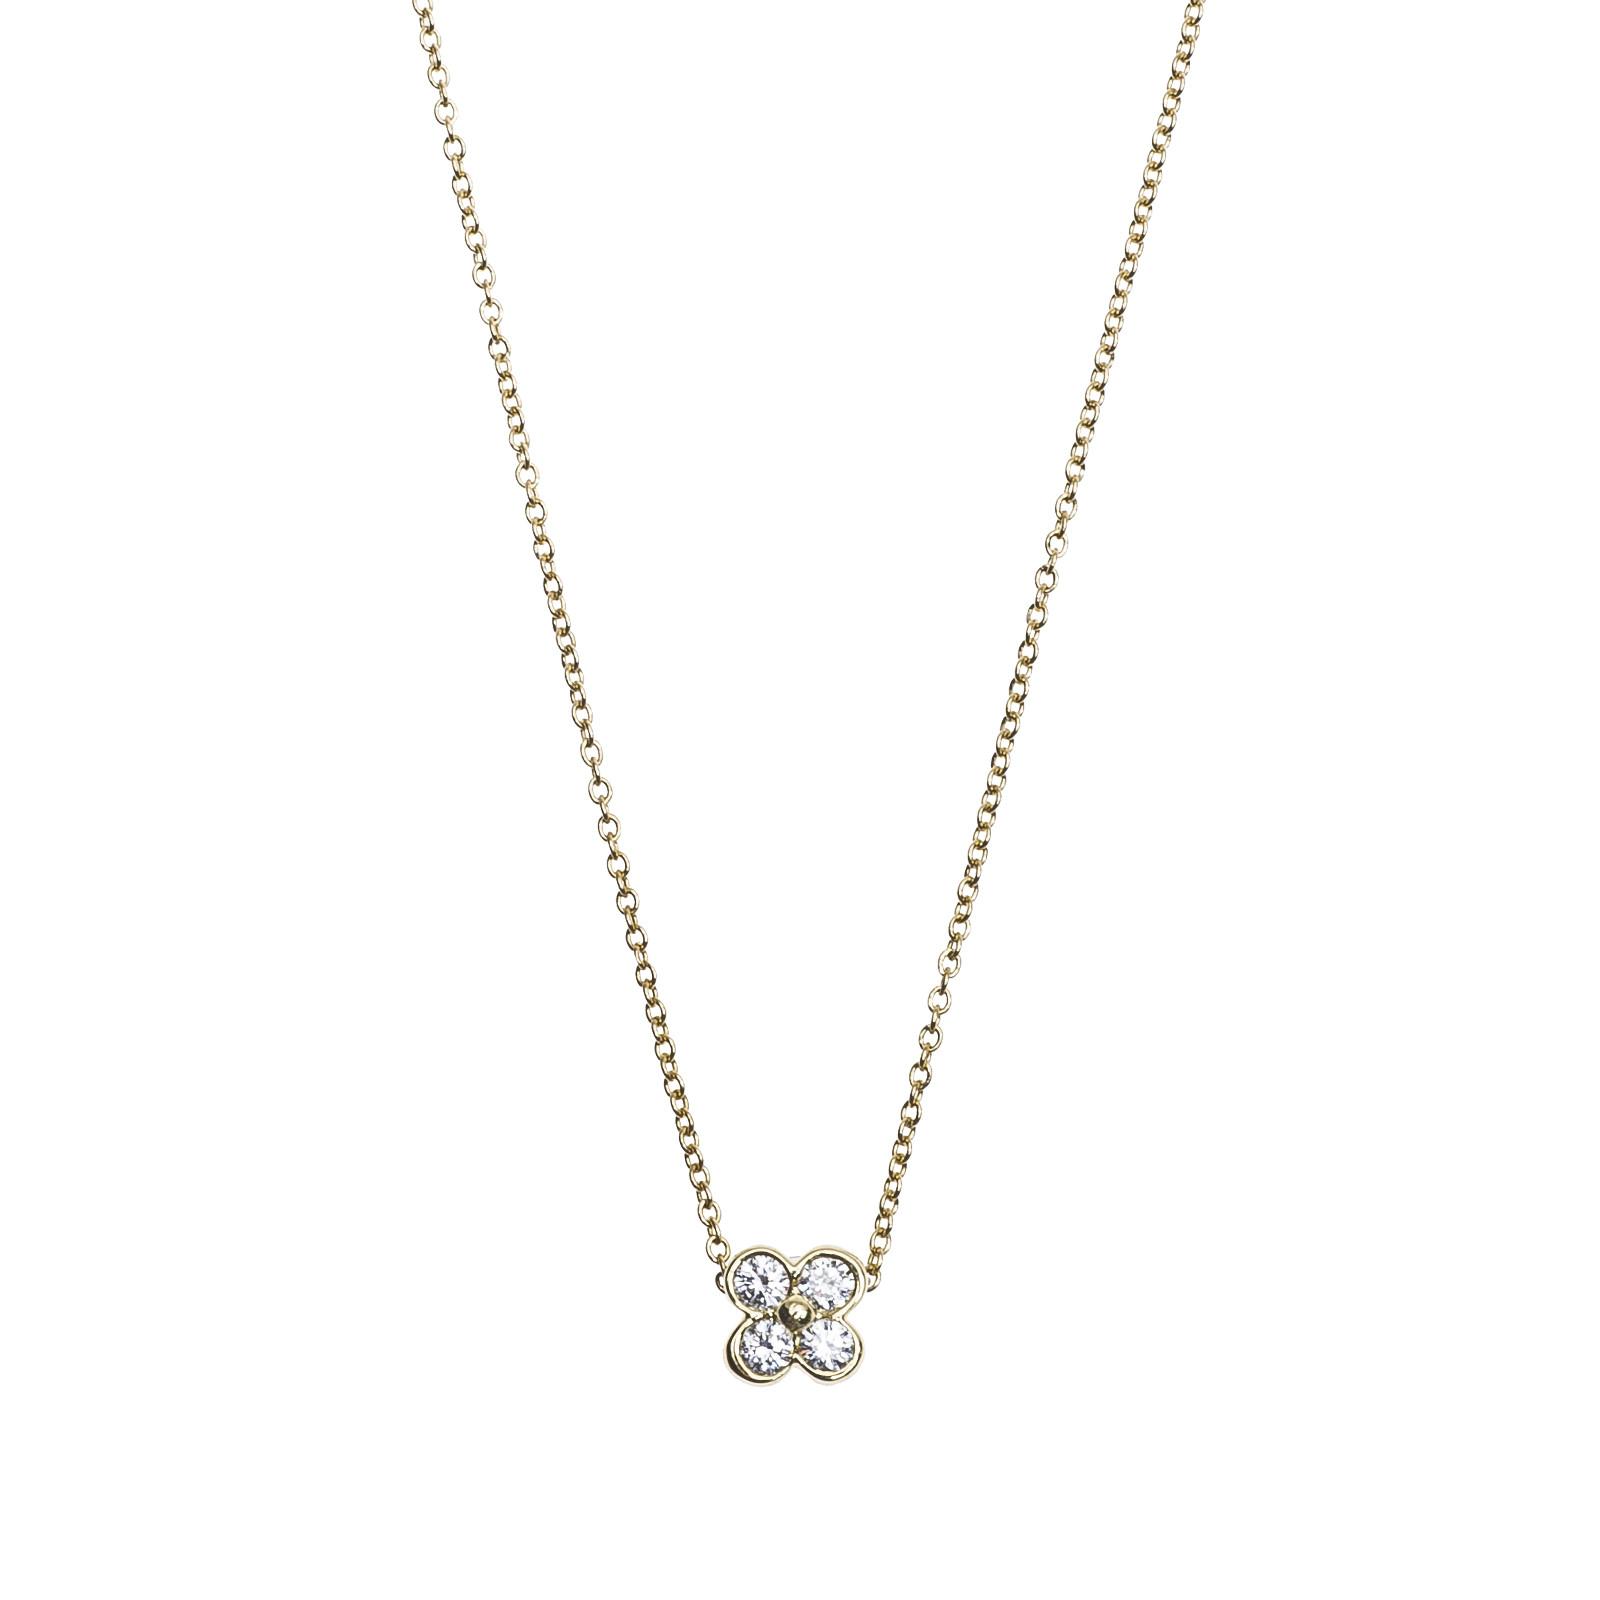 Vintage Tiffany & Co. 0.20 CTW Diamond Cluster Necklace